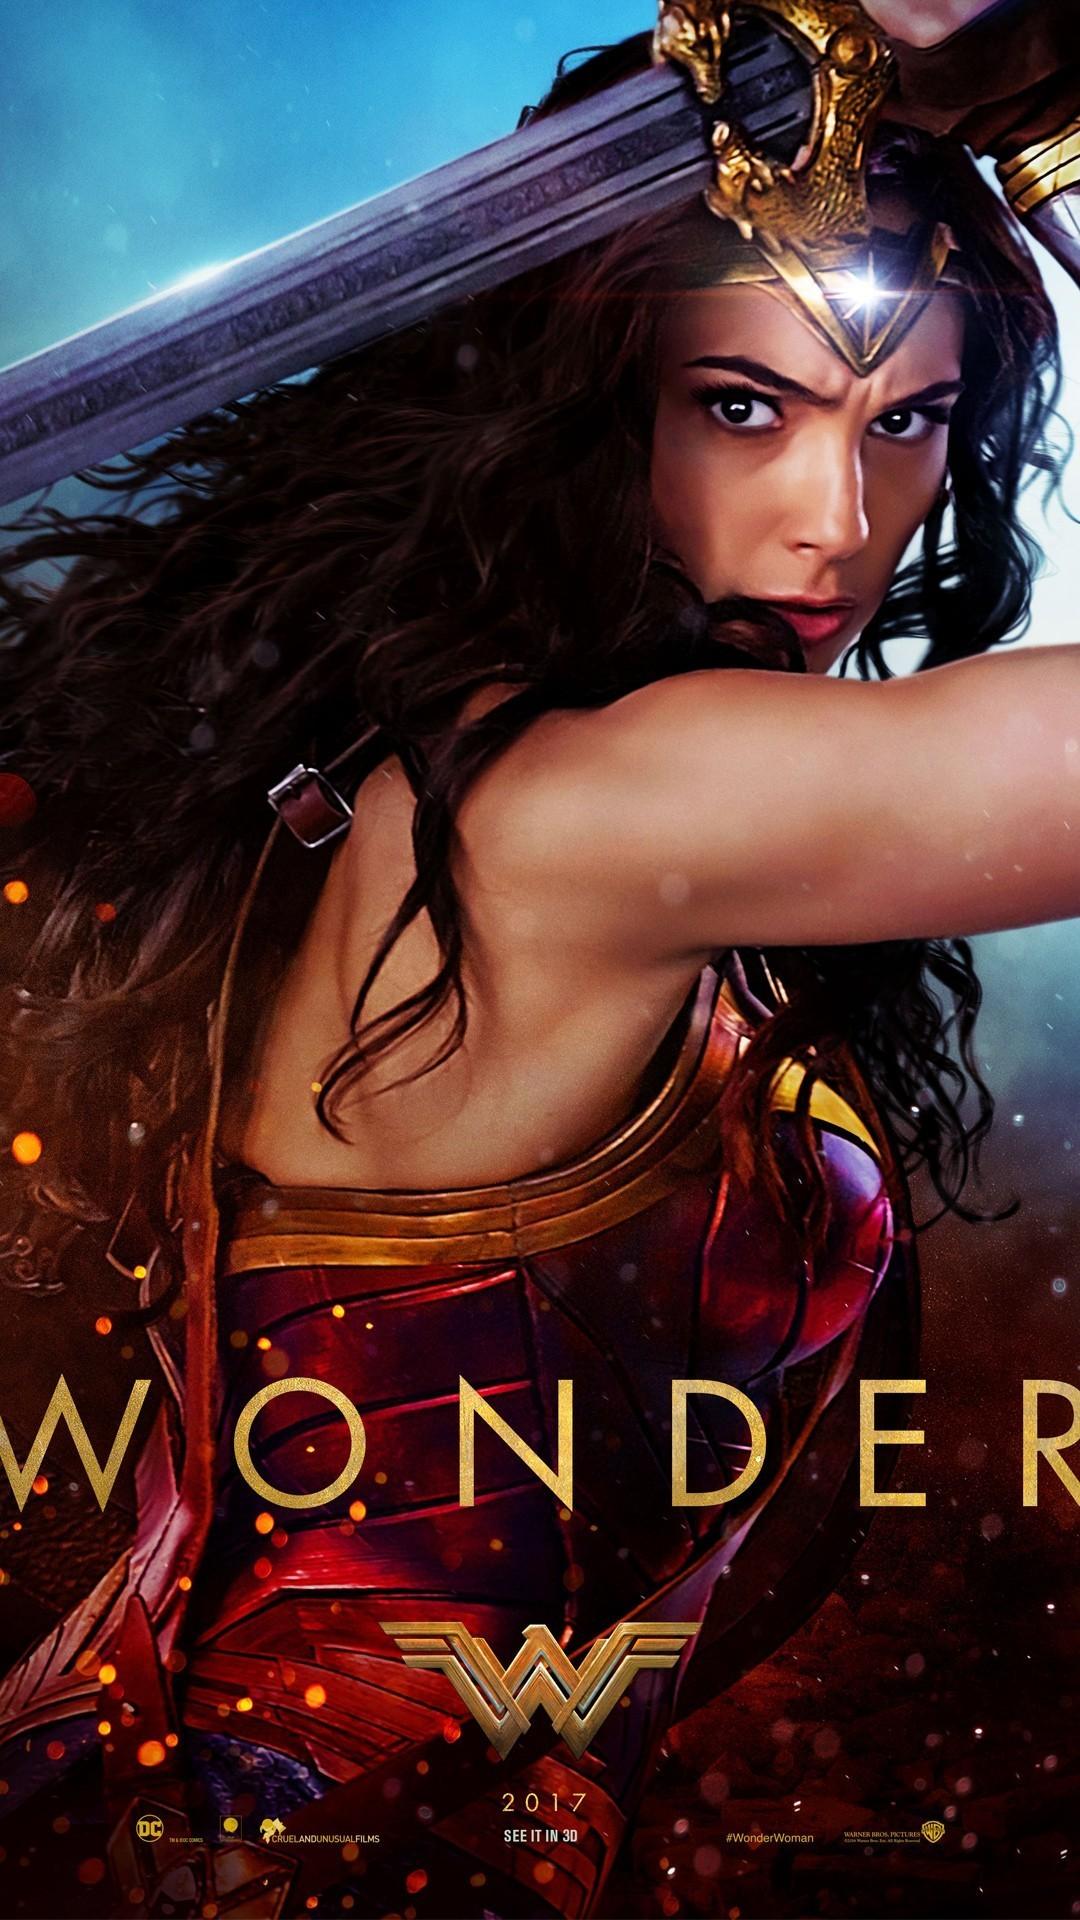 Res: 1080x1920, Wonder Woman Wallpaper 2017 resolution